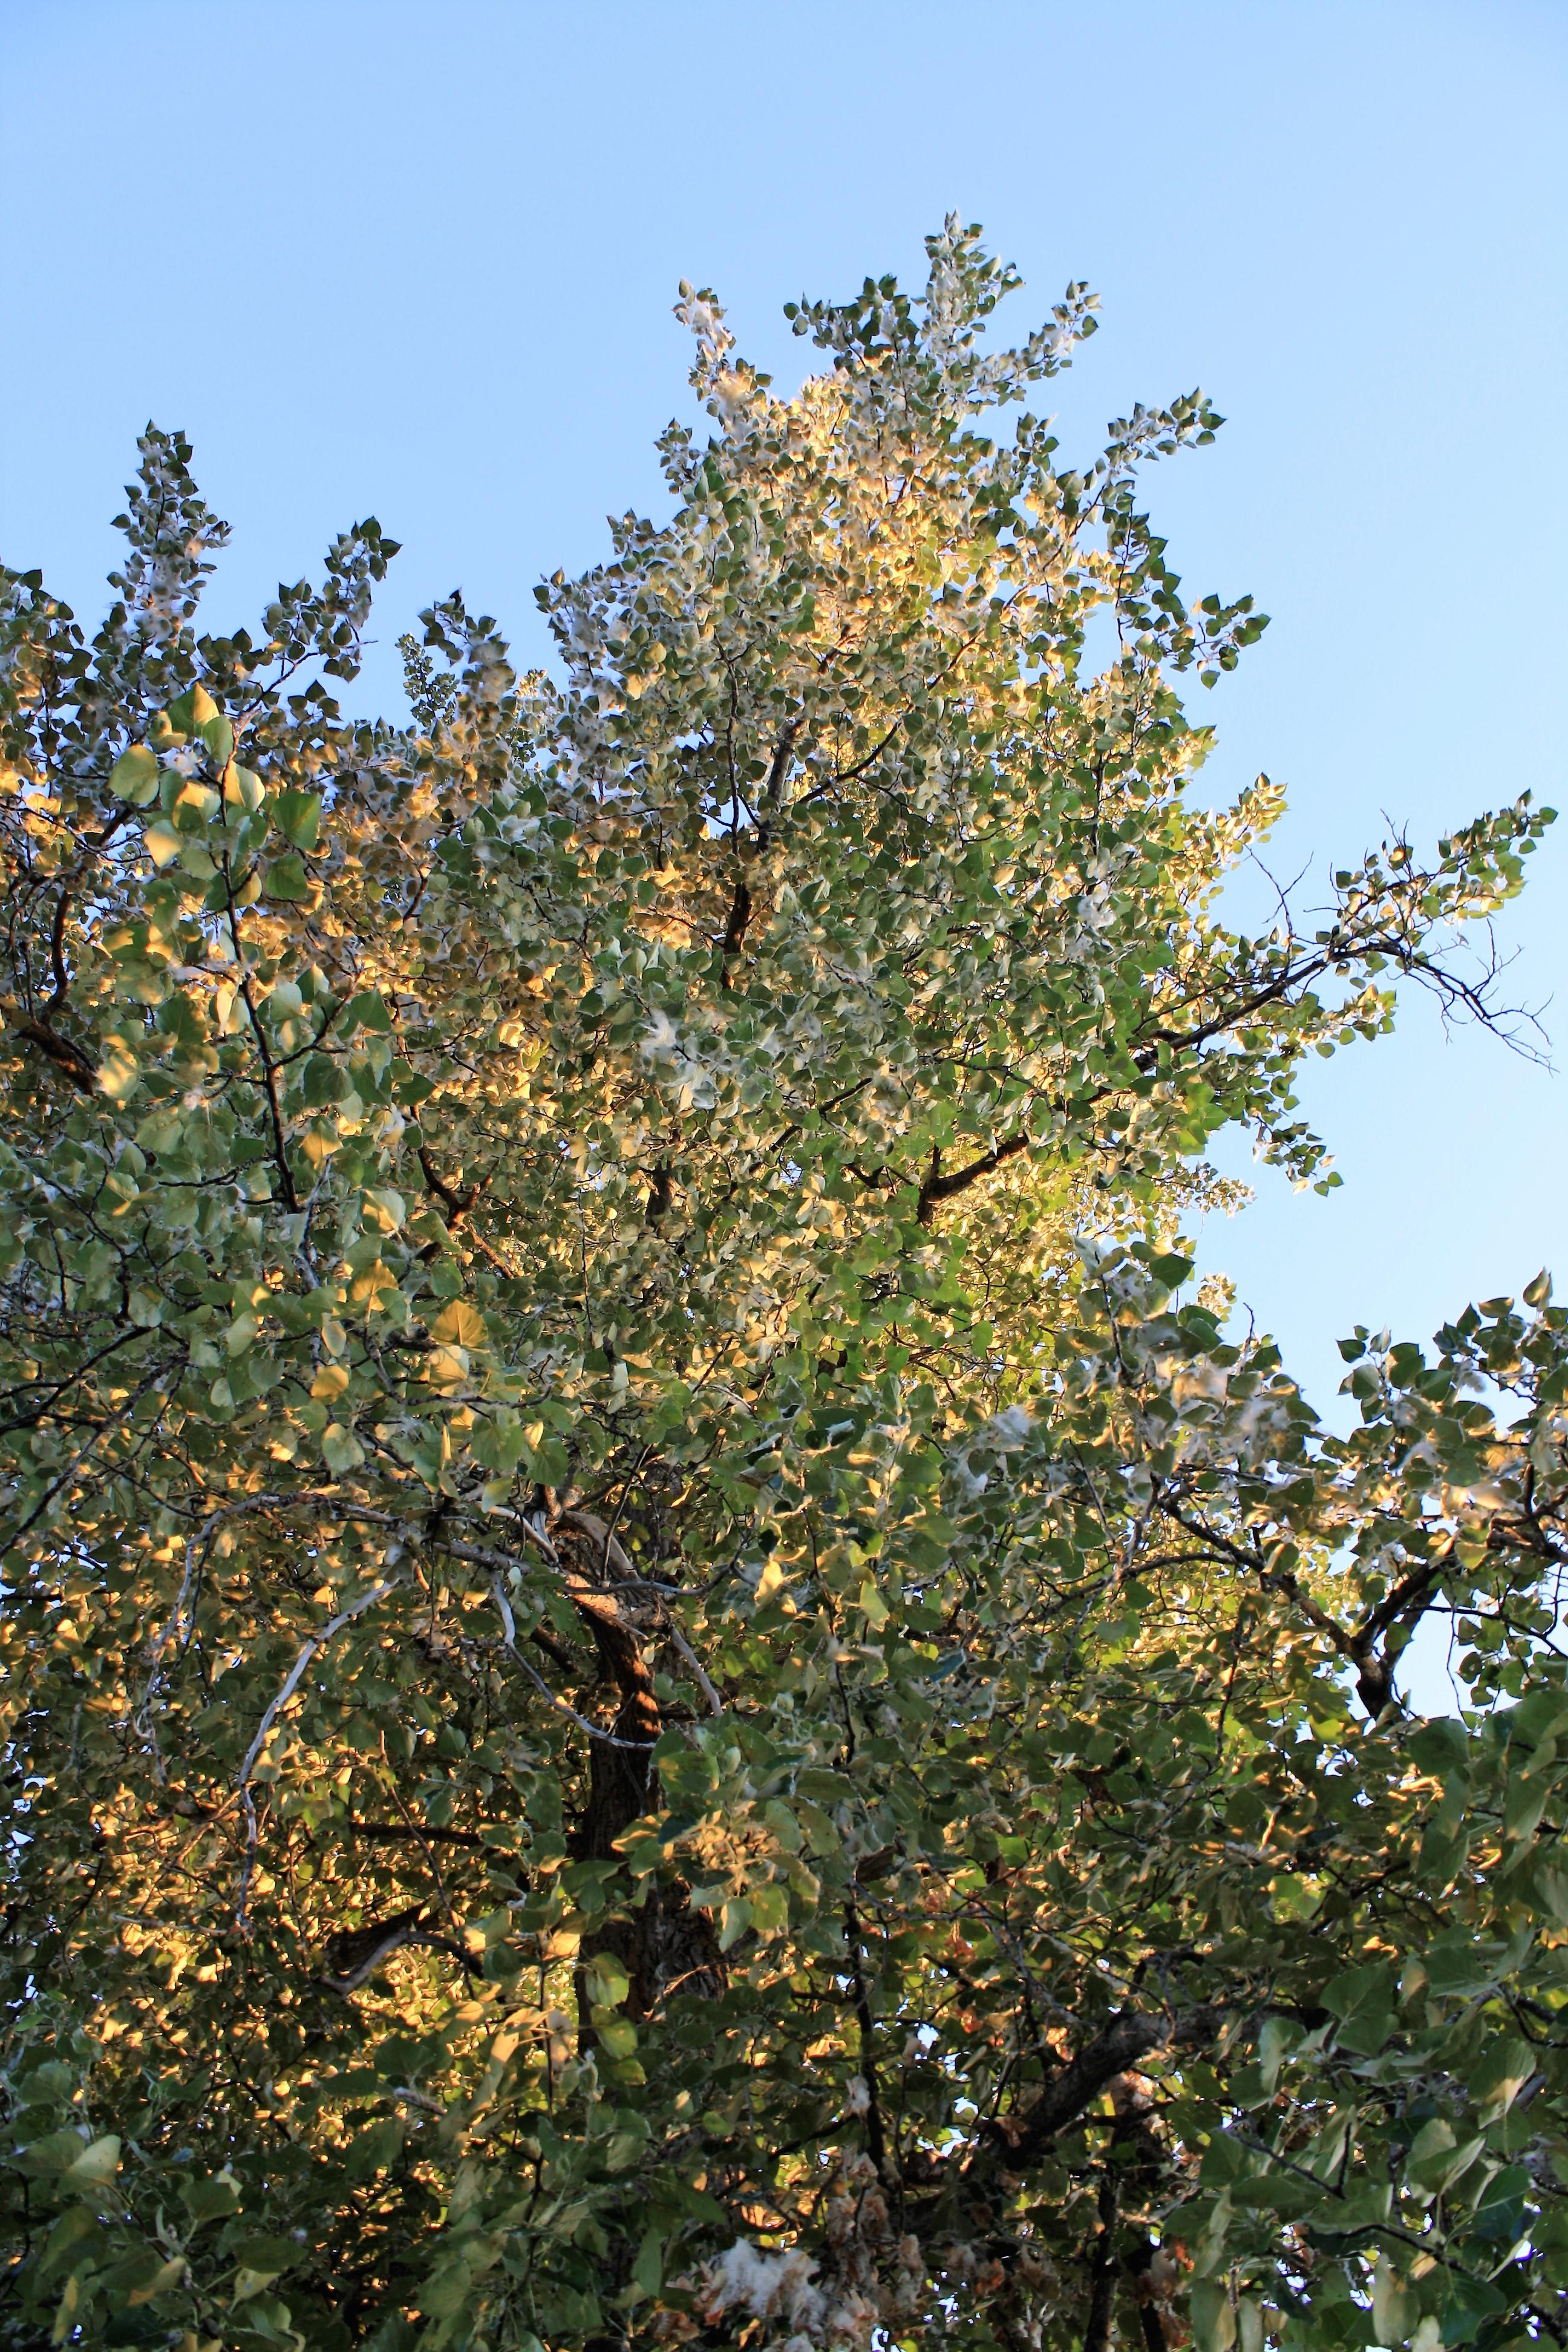 DM_nature_foliage_trees_342